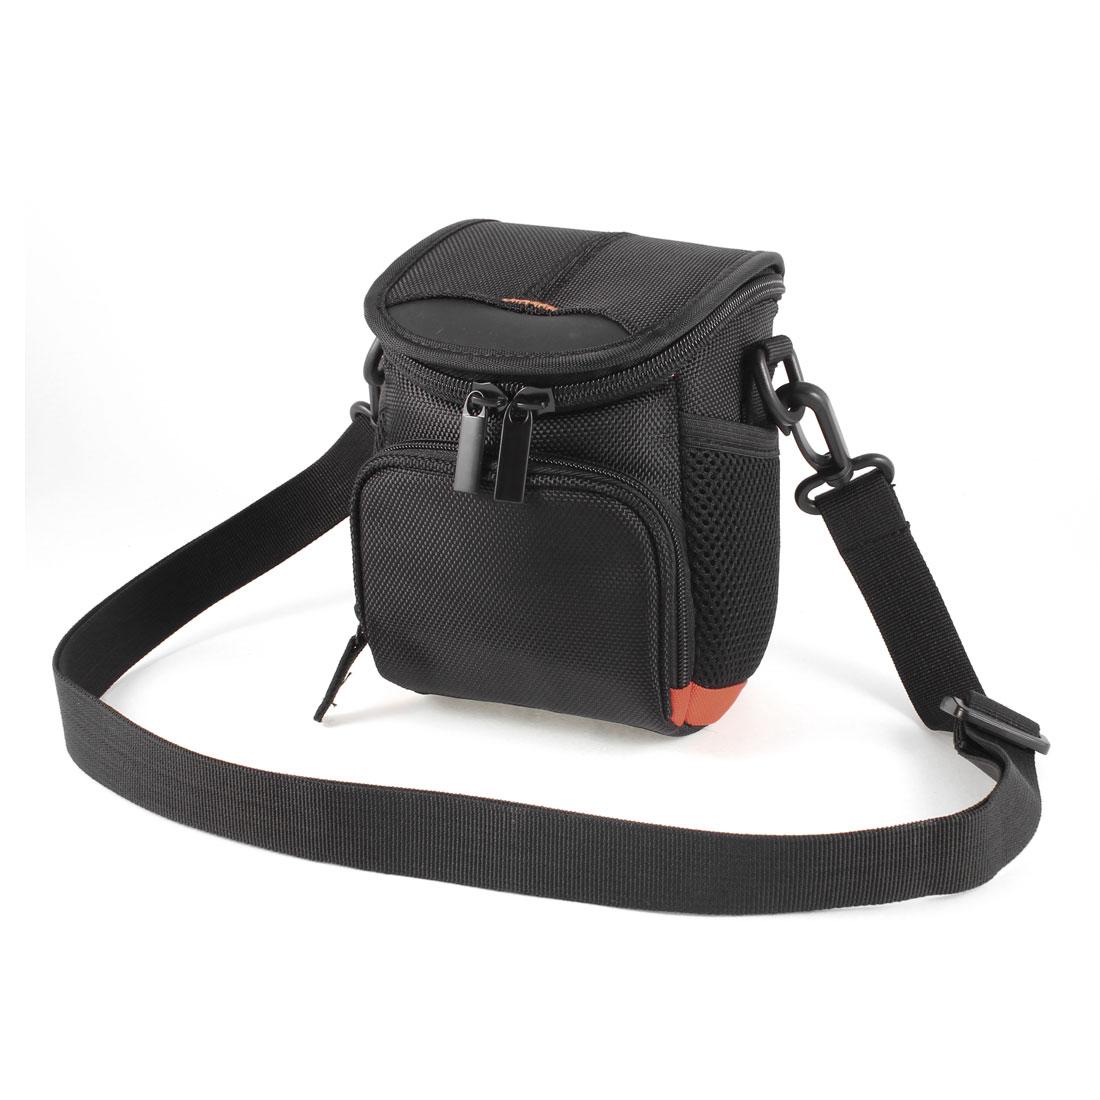 Zipper Closure Two Main Compartment Digital Camera Bag Case Holder Black w Strap